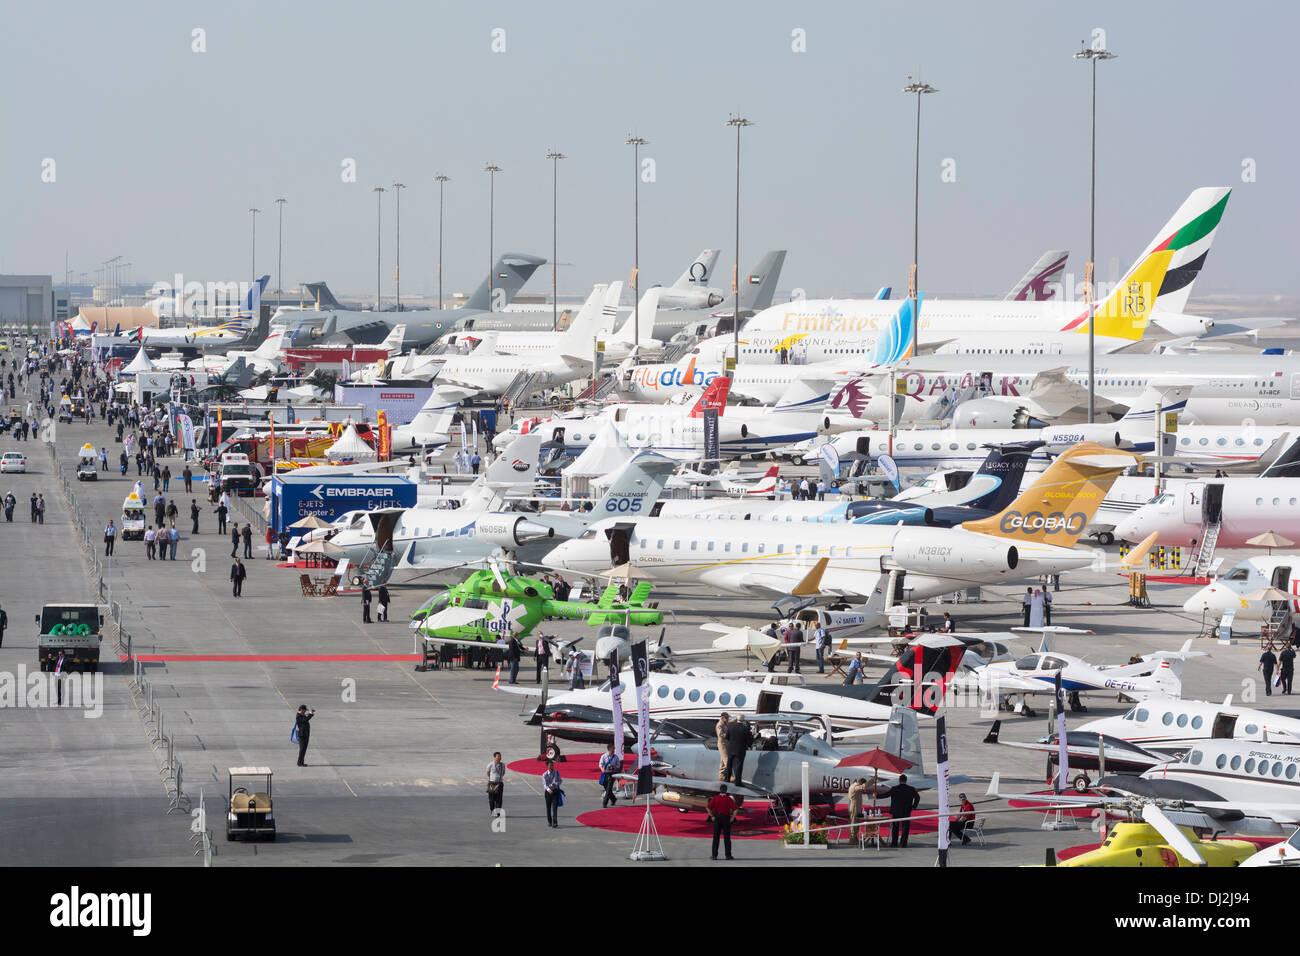 White apron dubai - Many Aircraft On Apron At Al Maktoum International Airport During Dubai Airshow 2013 In United Arab